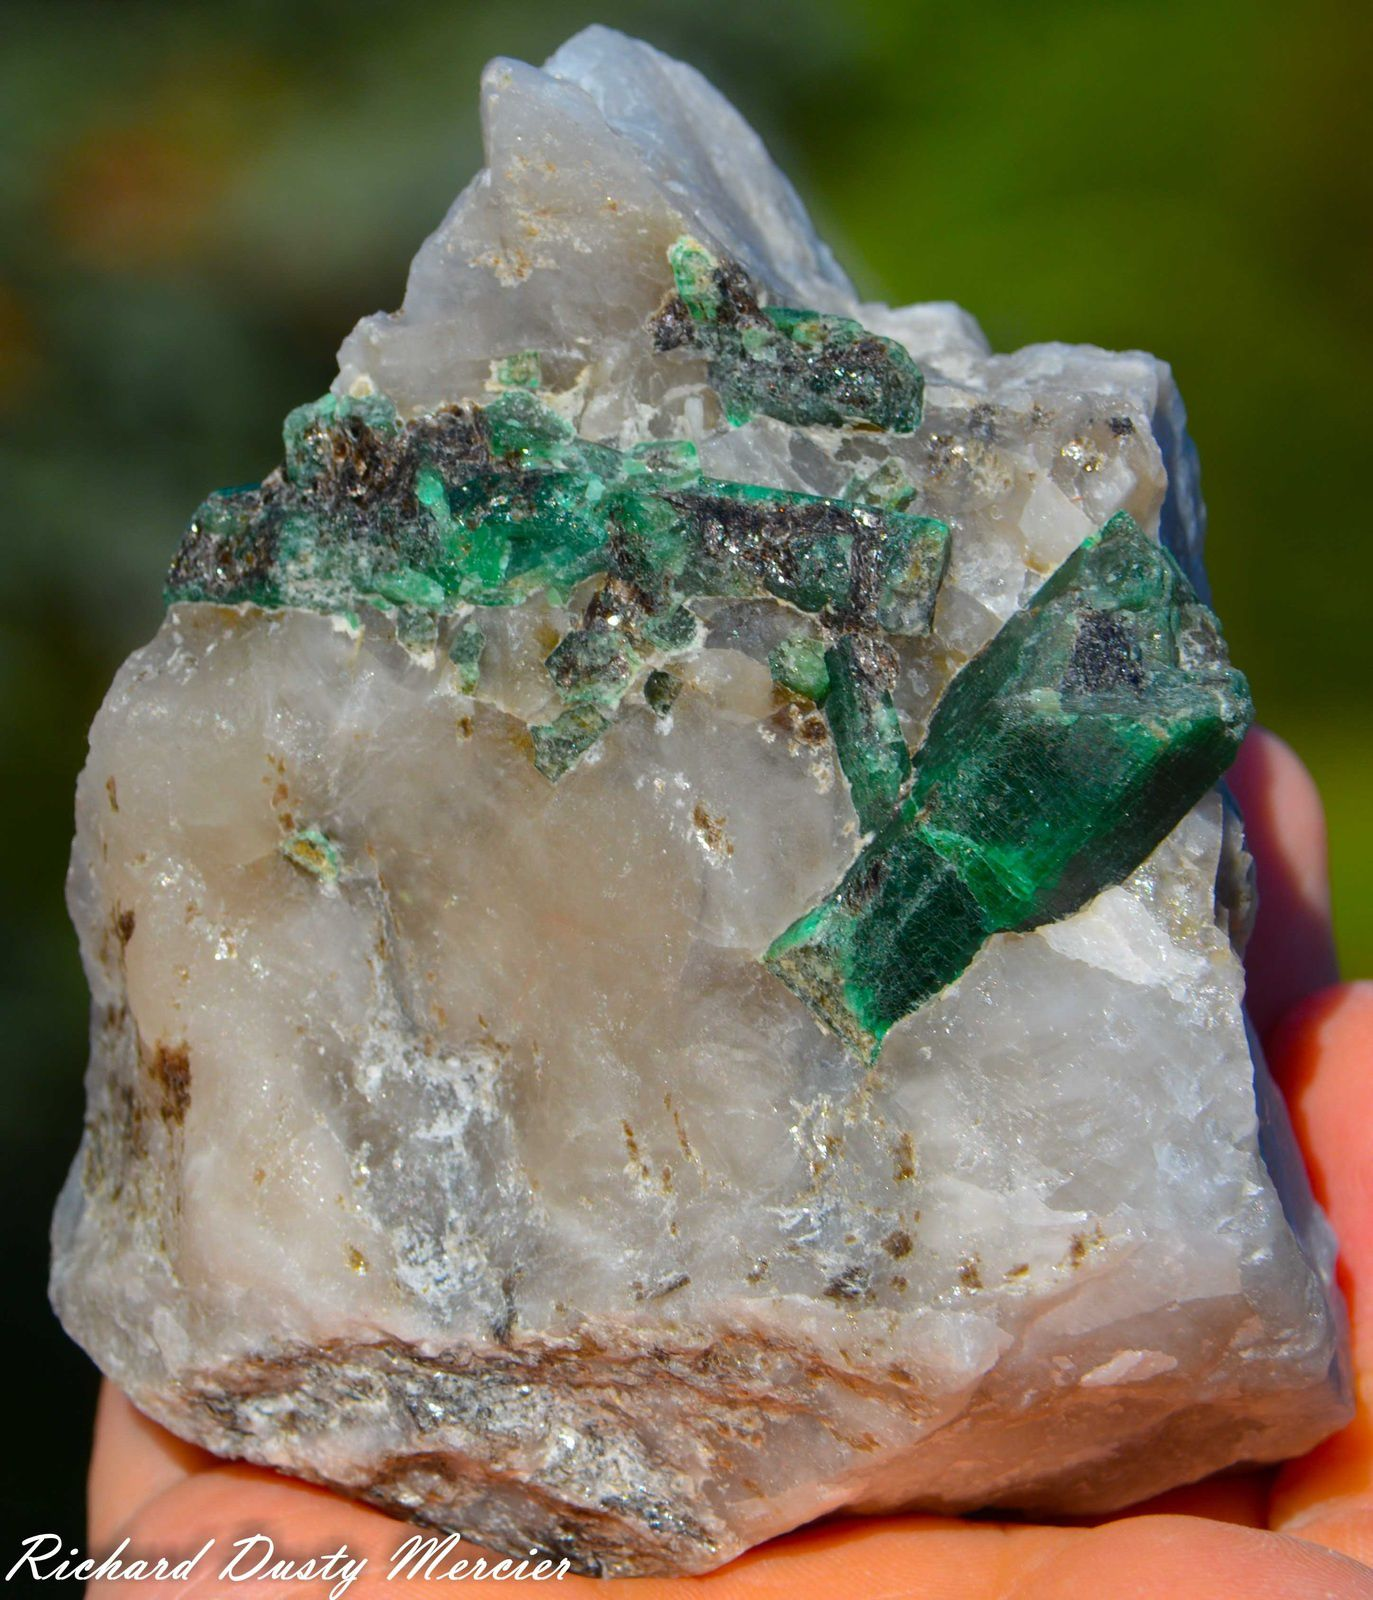 Emerald (Emeraude) on Quartz from Bahia, Brazil (size: Small cabinet)